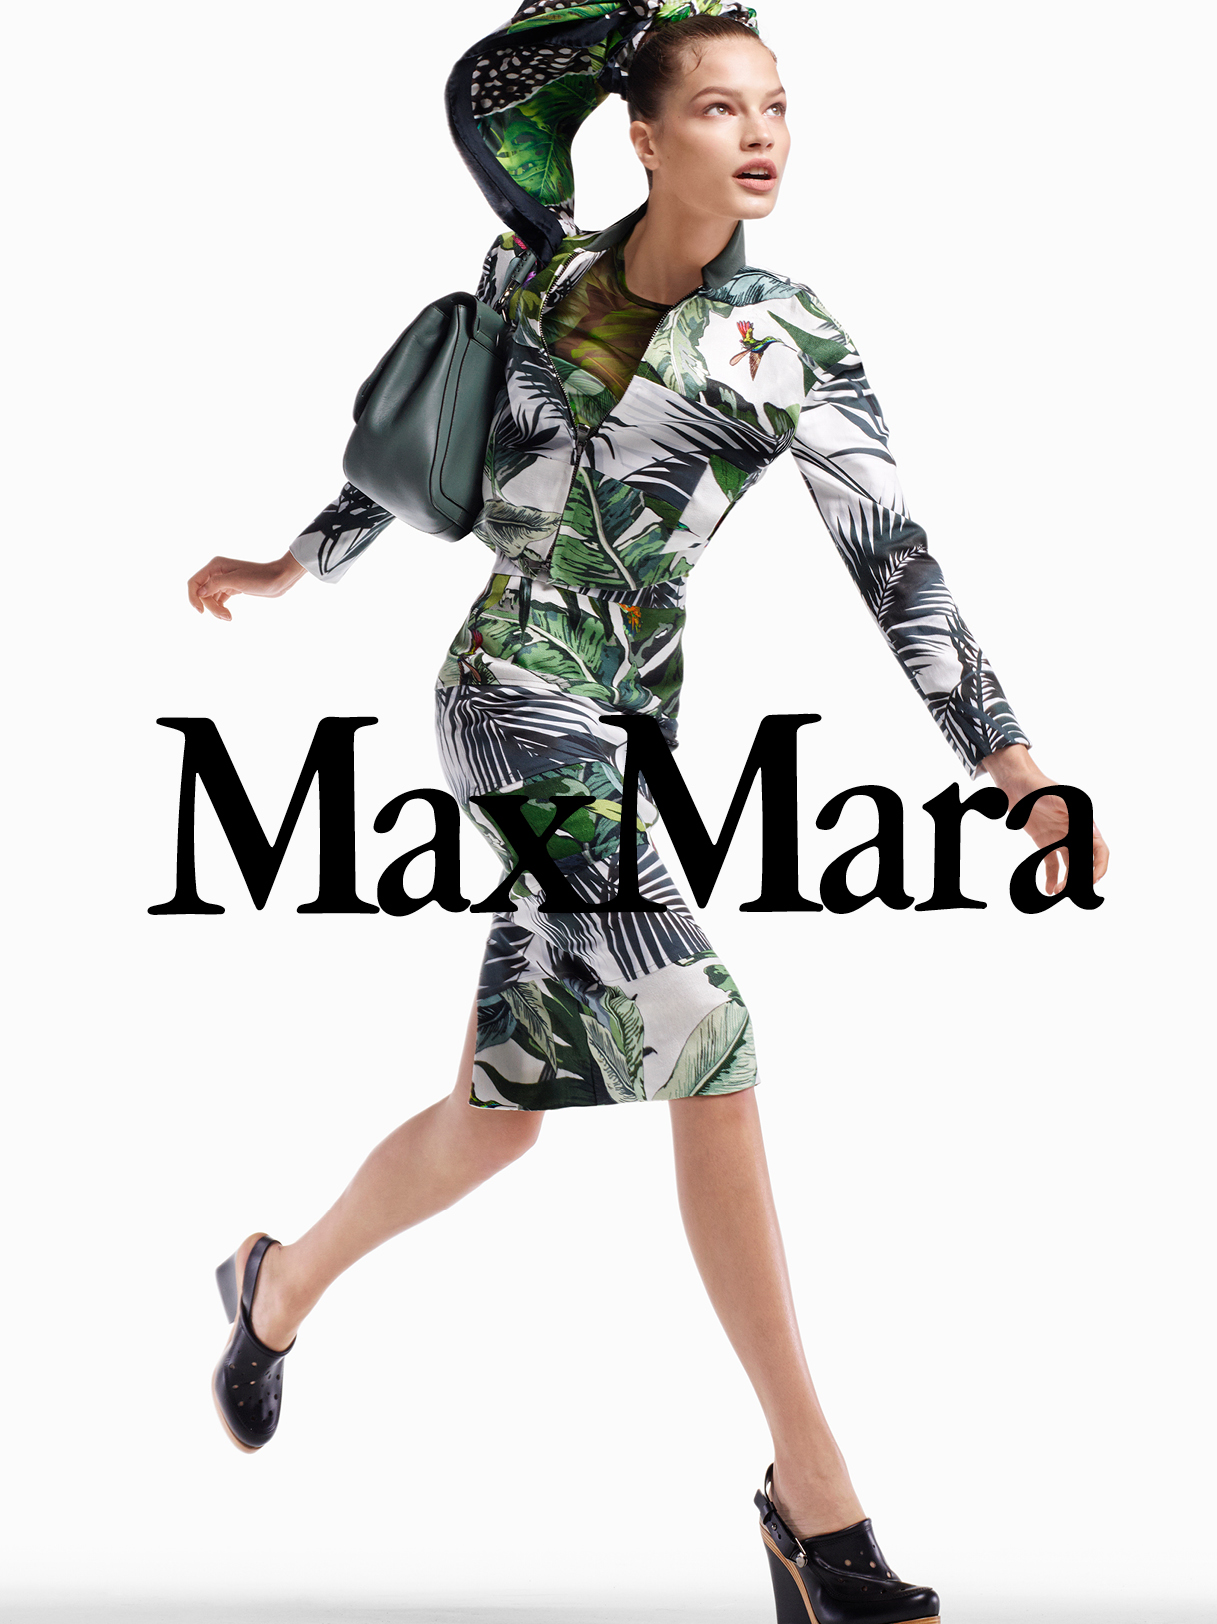 #maxmara #ss17 #stevenmeisel #carineroitfeld #faretta #fashion #campaign #jimkaemmerling #patmcgrath #guidopalau